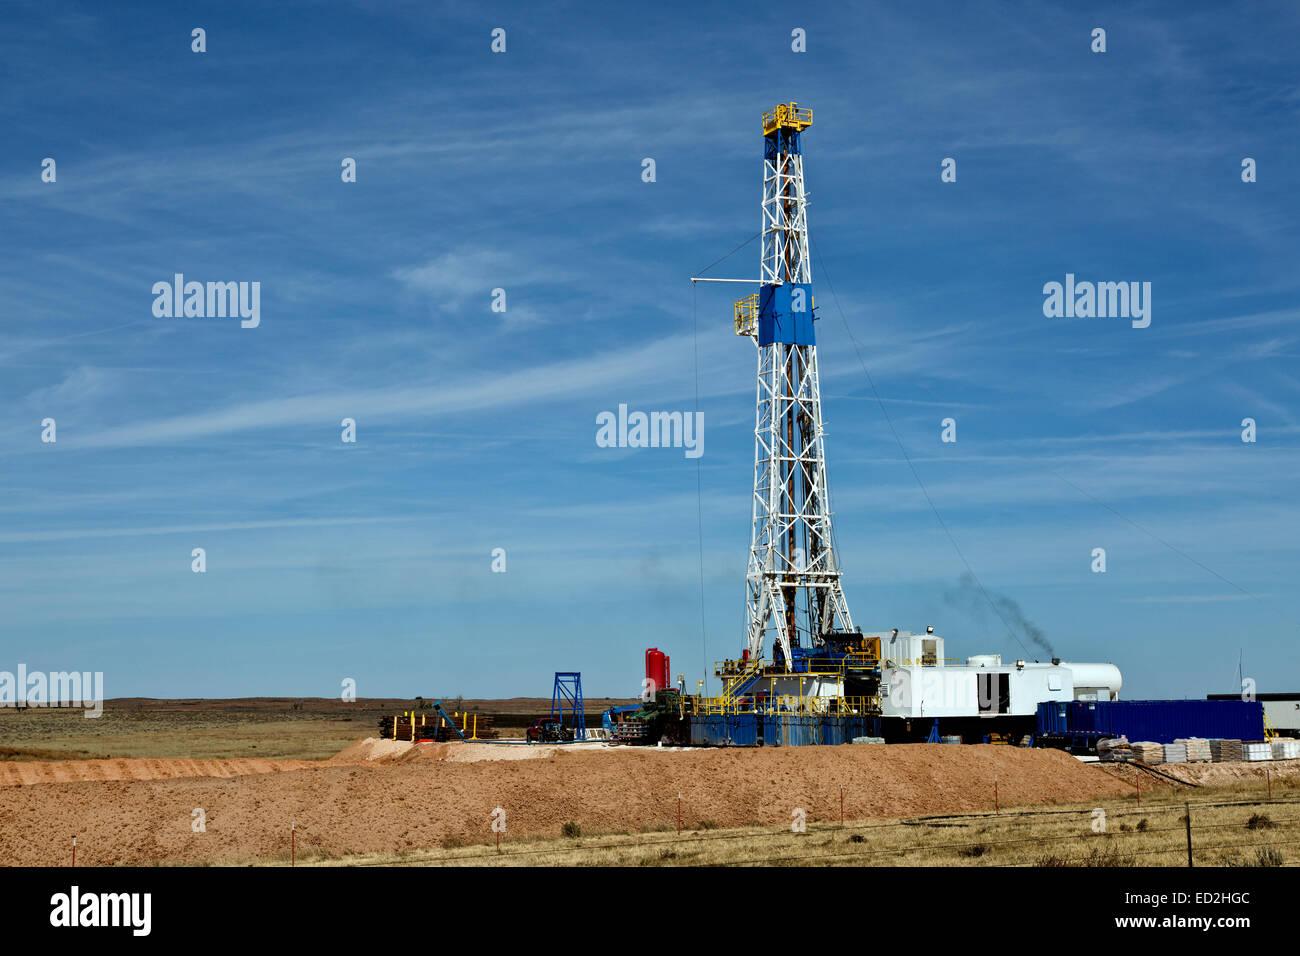 Flex drill rig operating, Texas - Stock Image